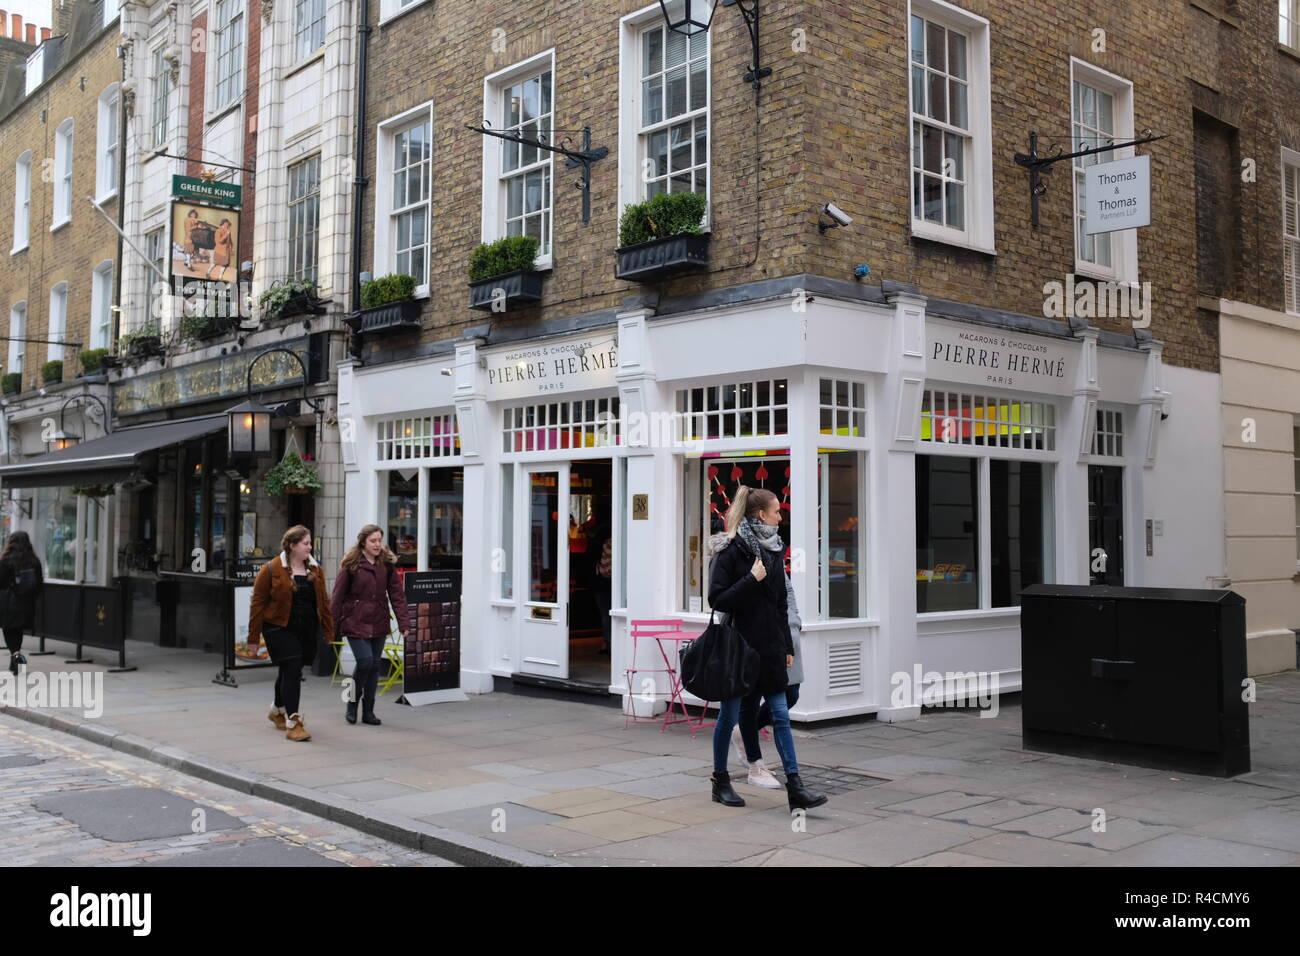 Pierre Herme shop, Covent Garden, London, England, UK - Stock Image